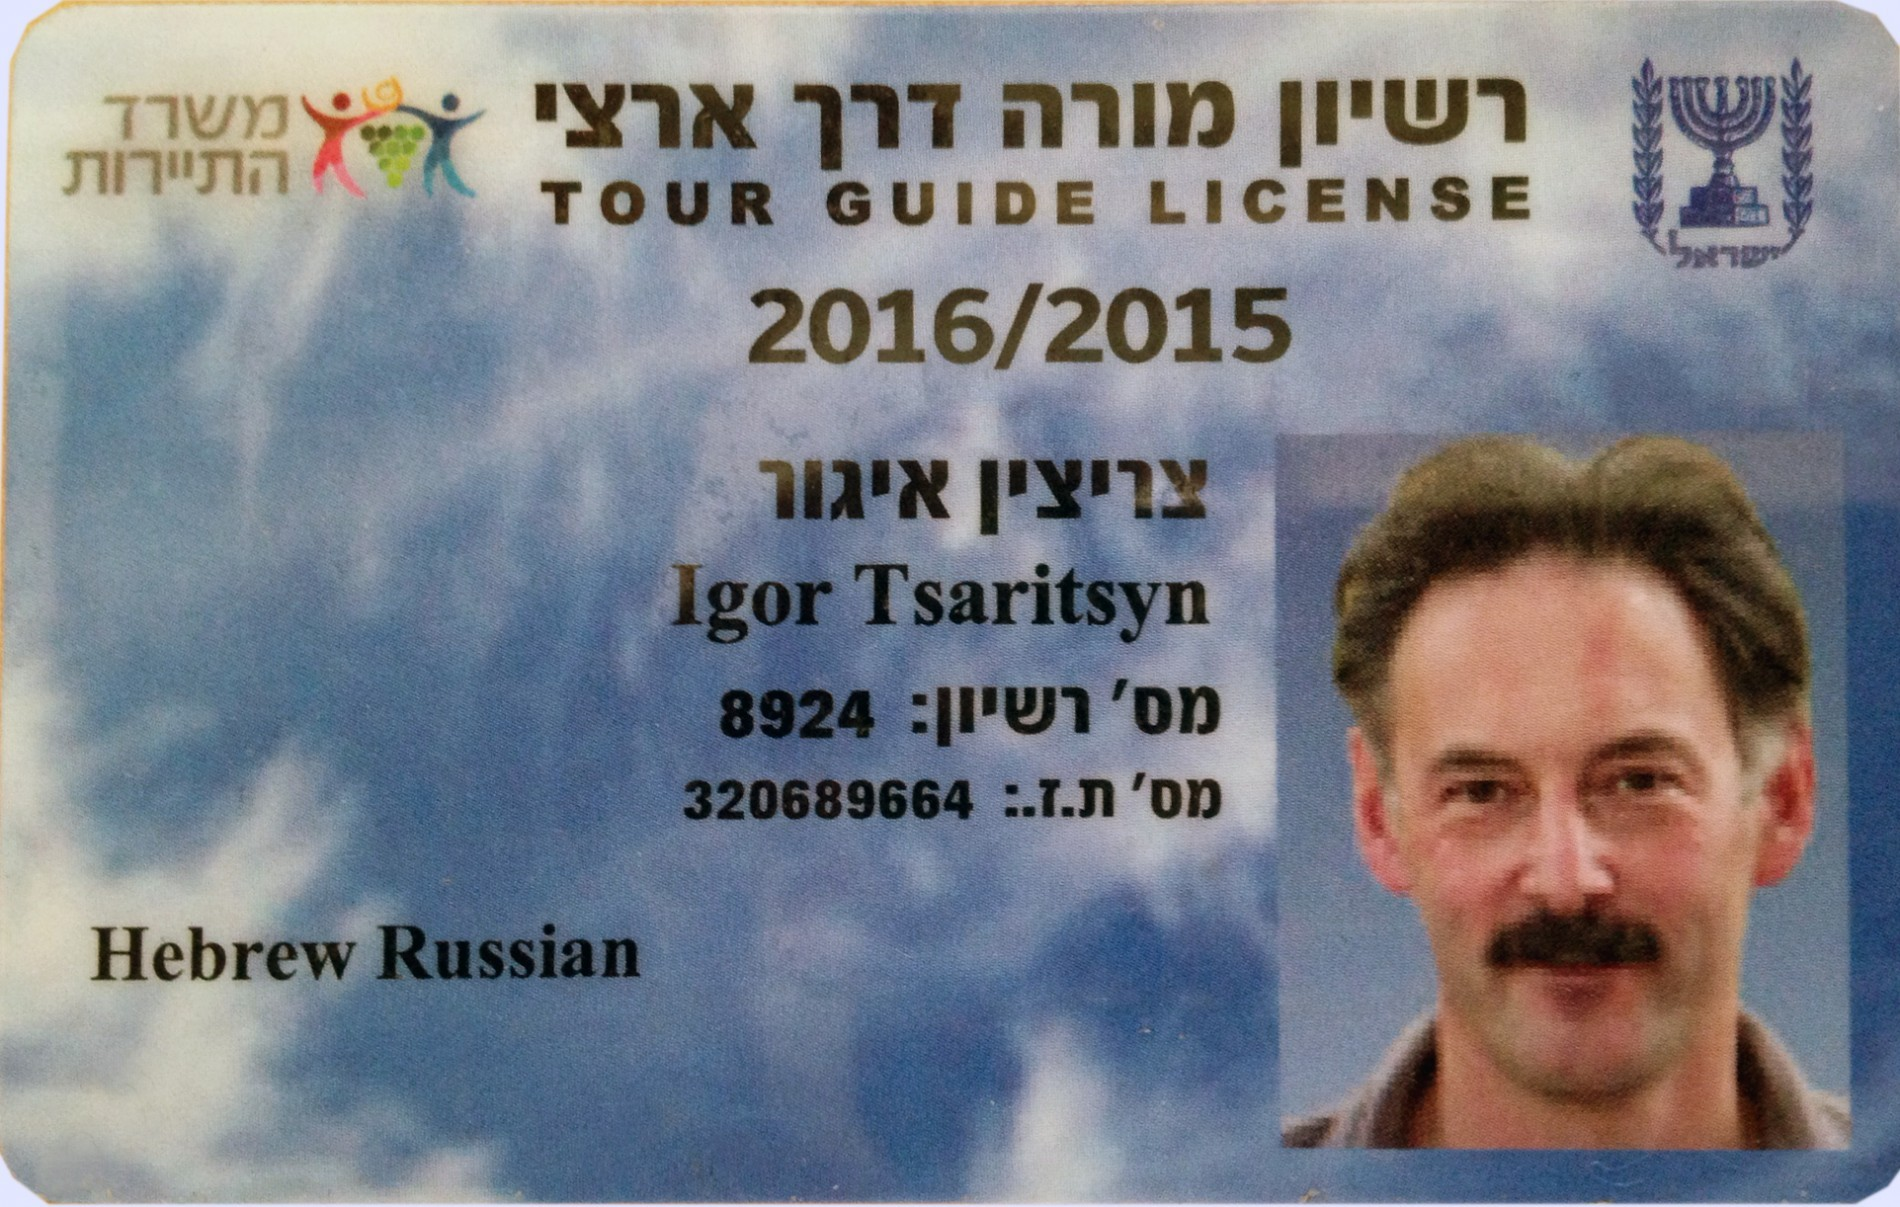 Tour Guide License 2015-2016